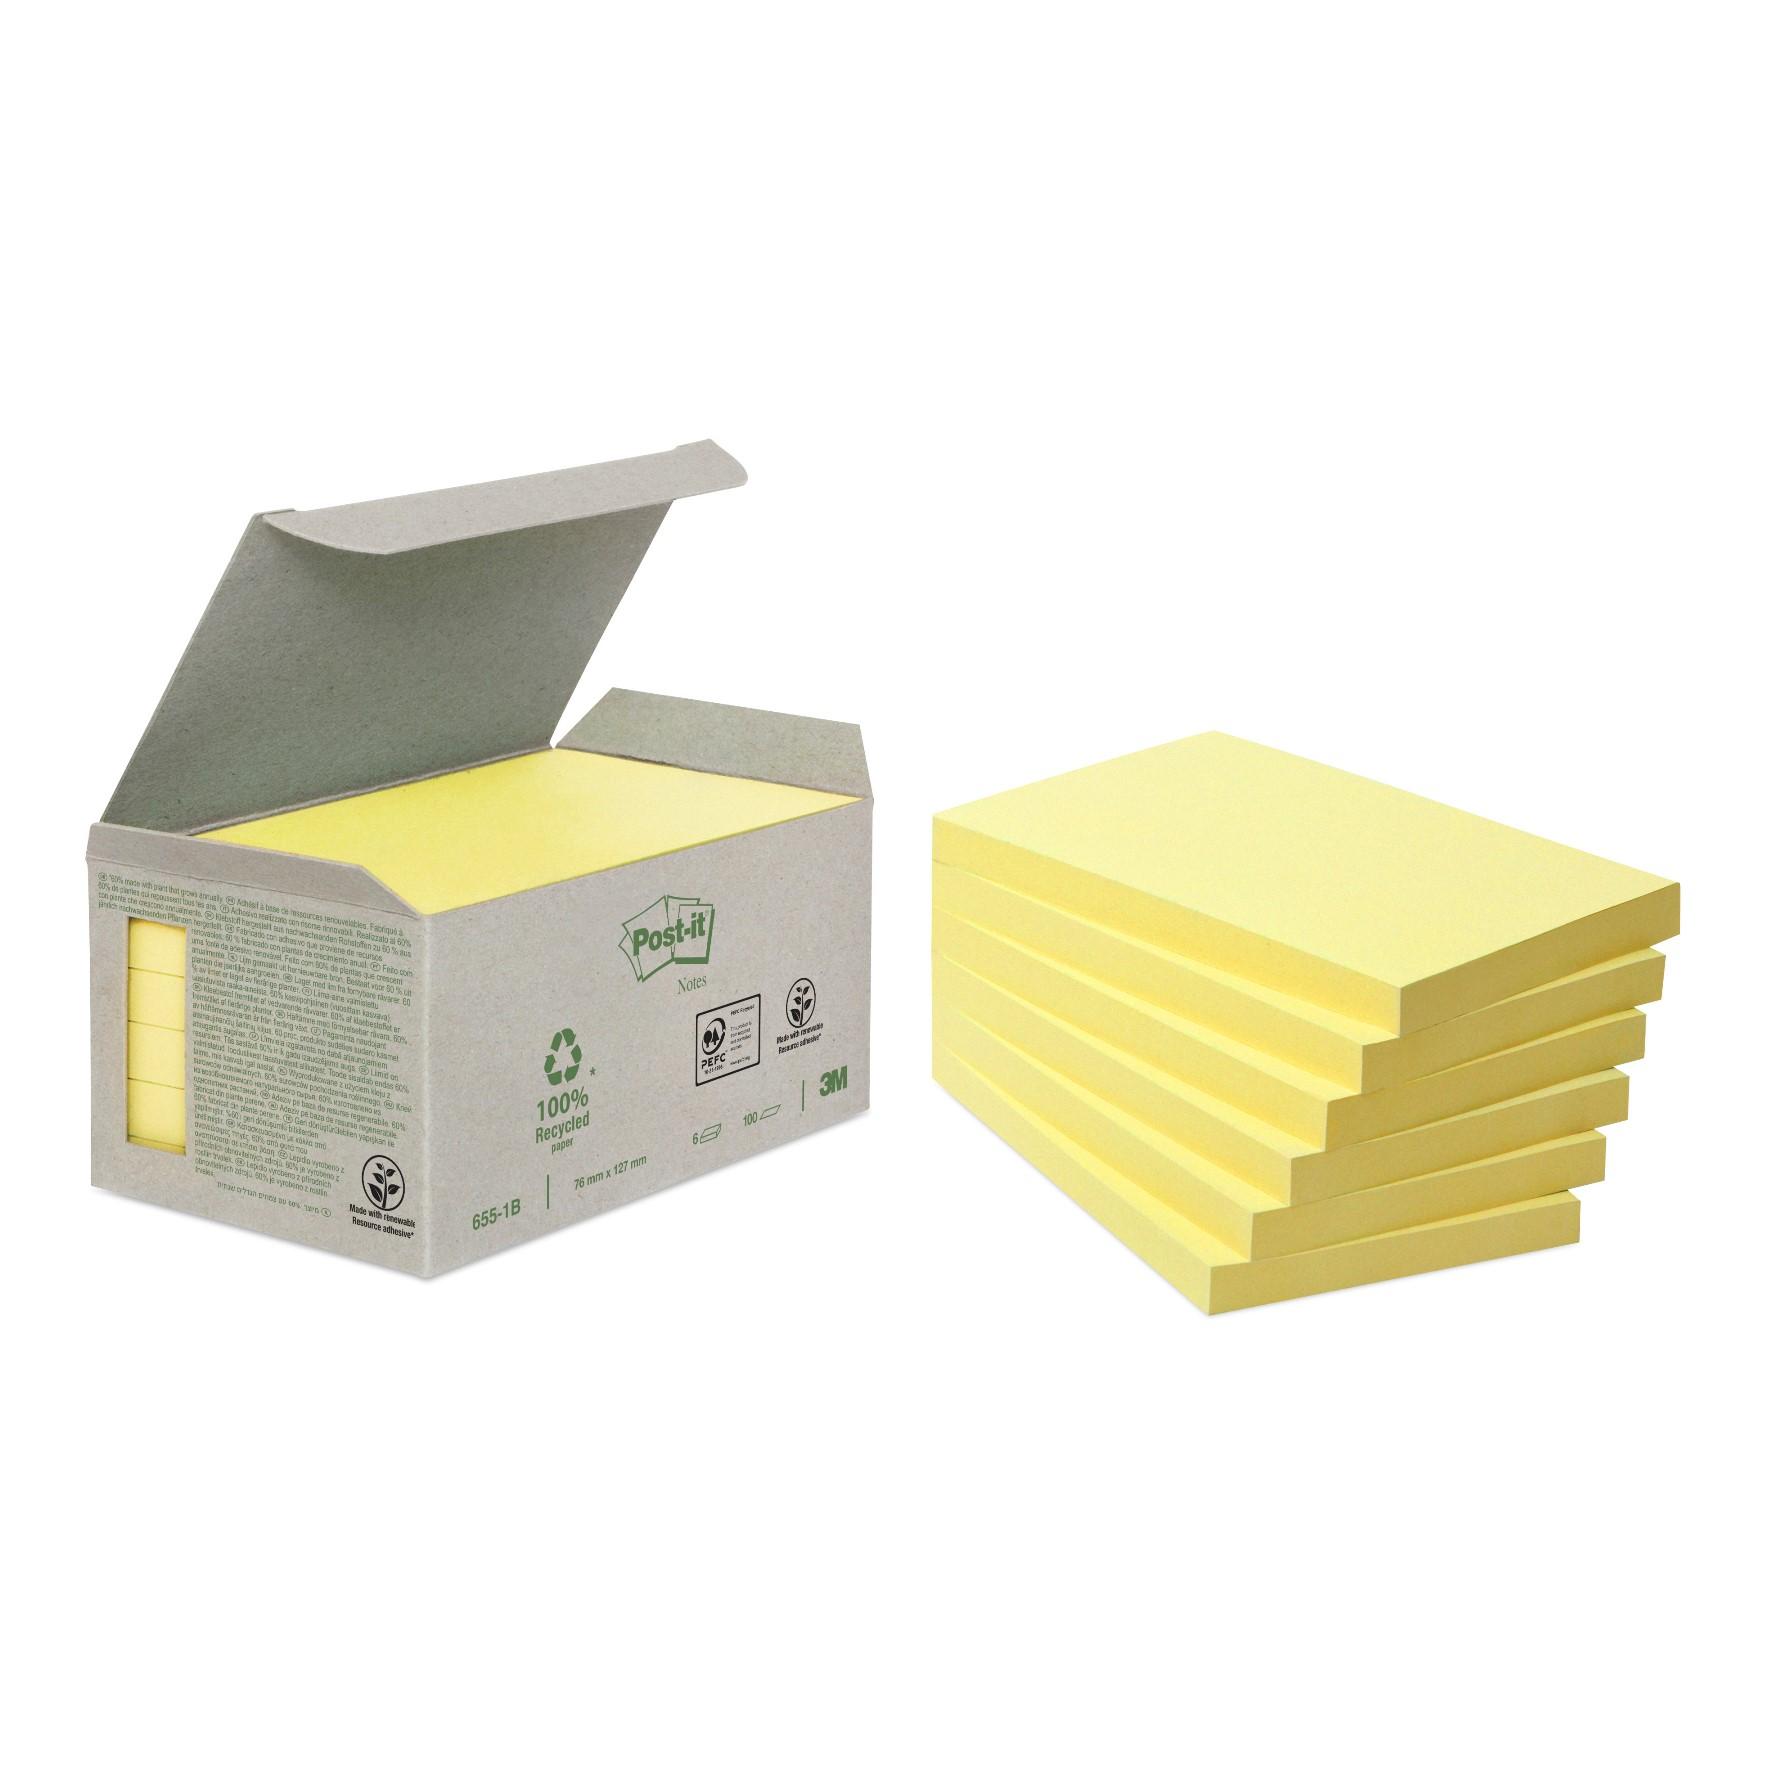 Post-it - 6 Blocs notes recyclées - 76 x 127 mm - jaune